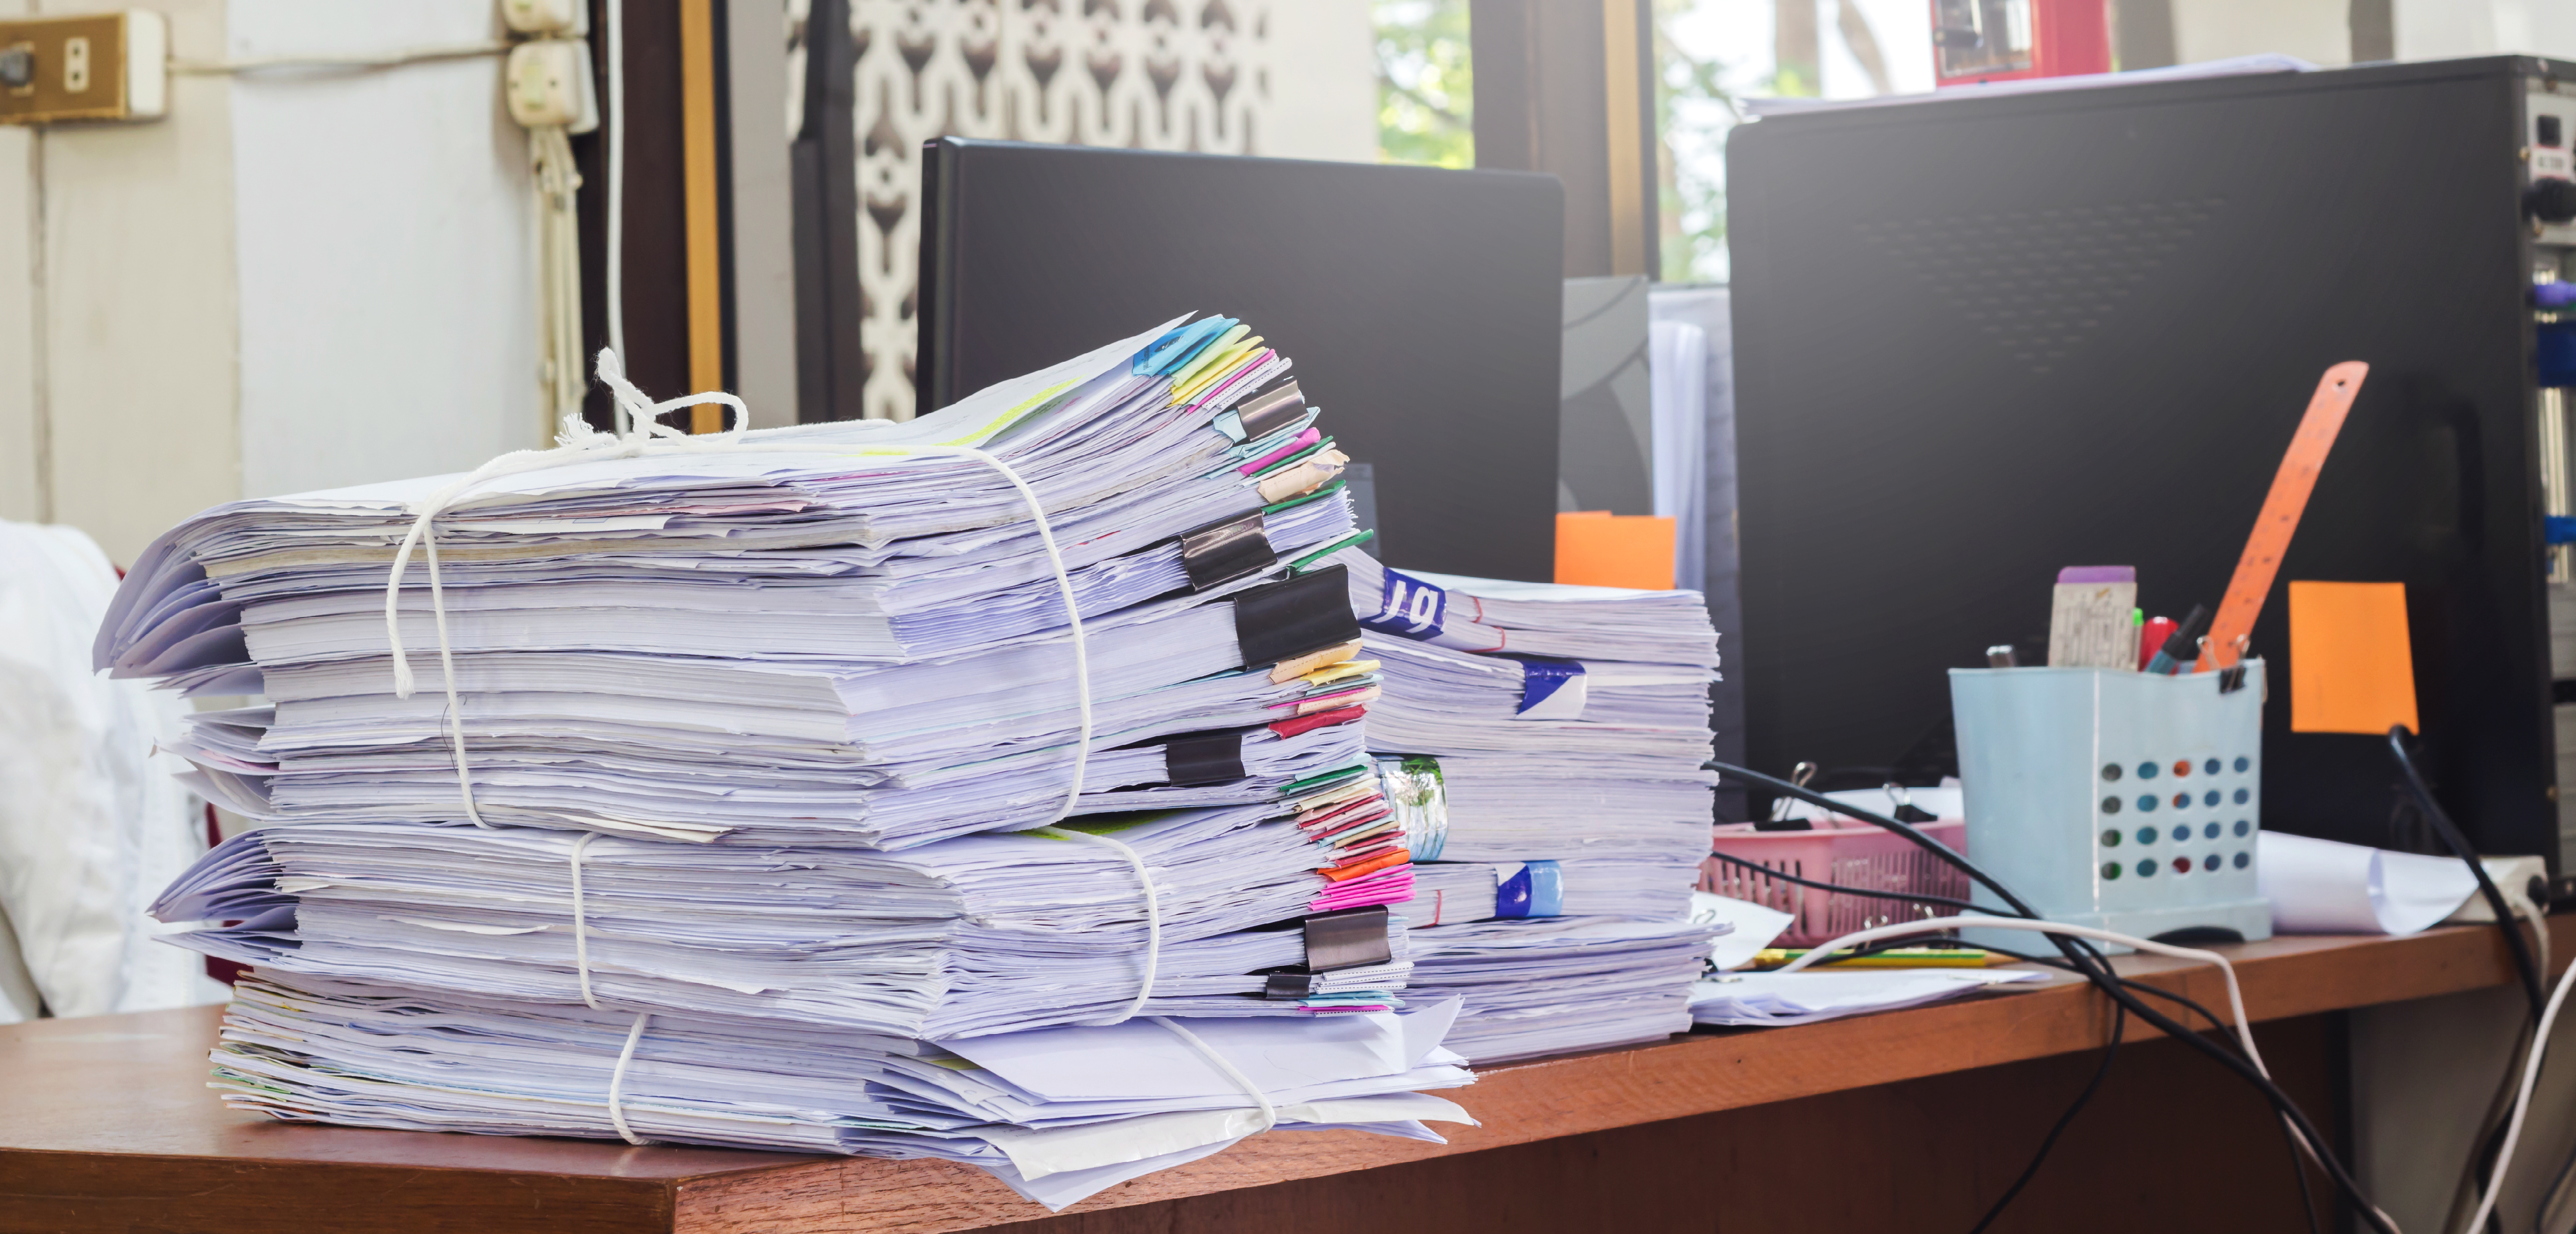 Desk full of tax documents